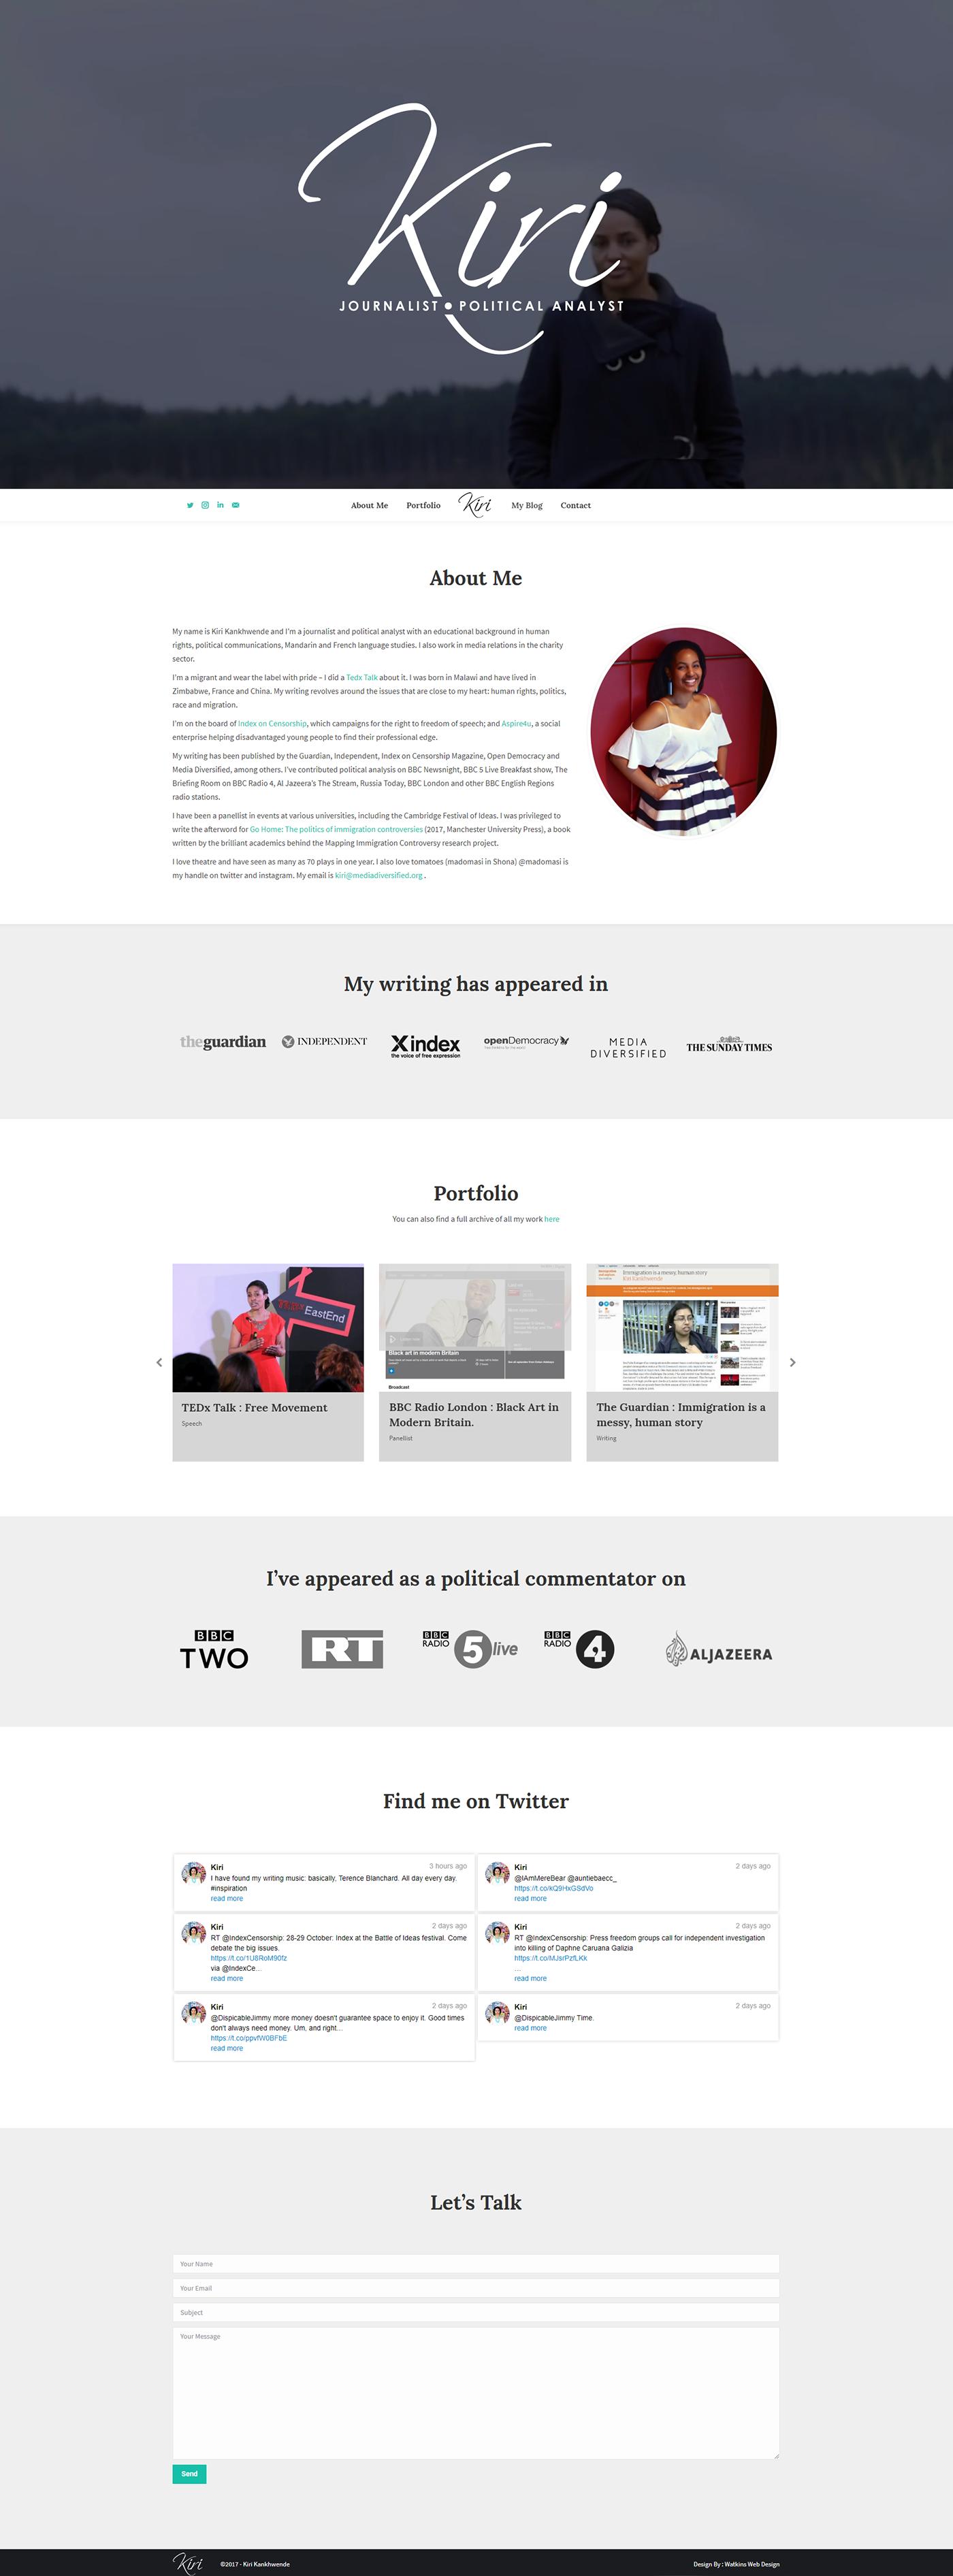 Web Design  portfolio site Journalist political commentator